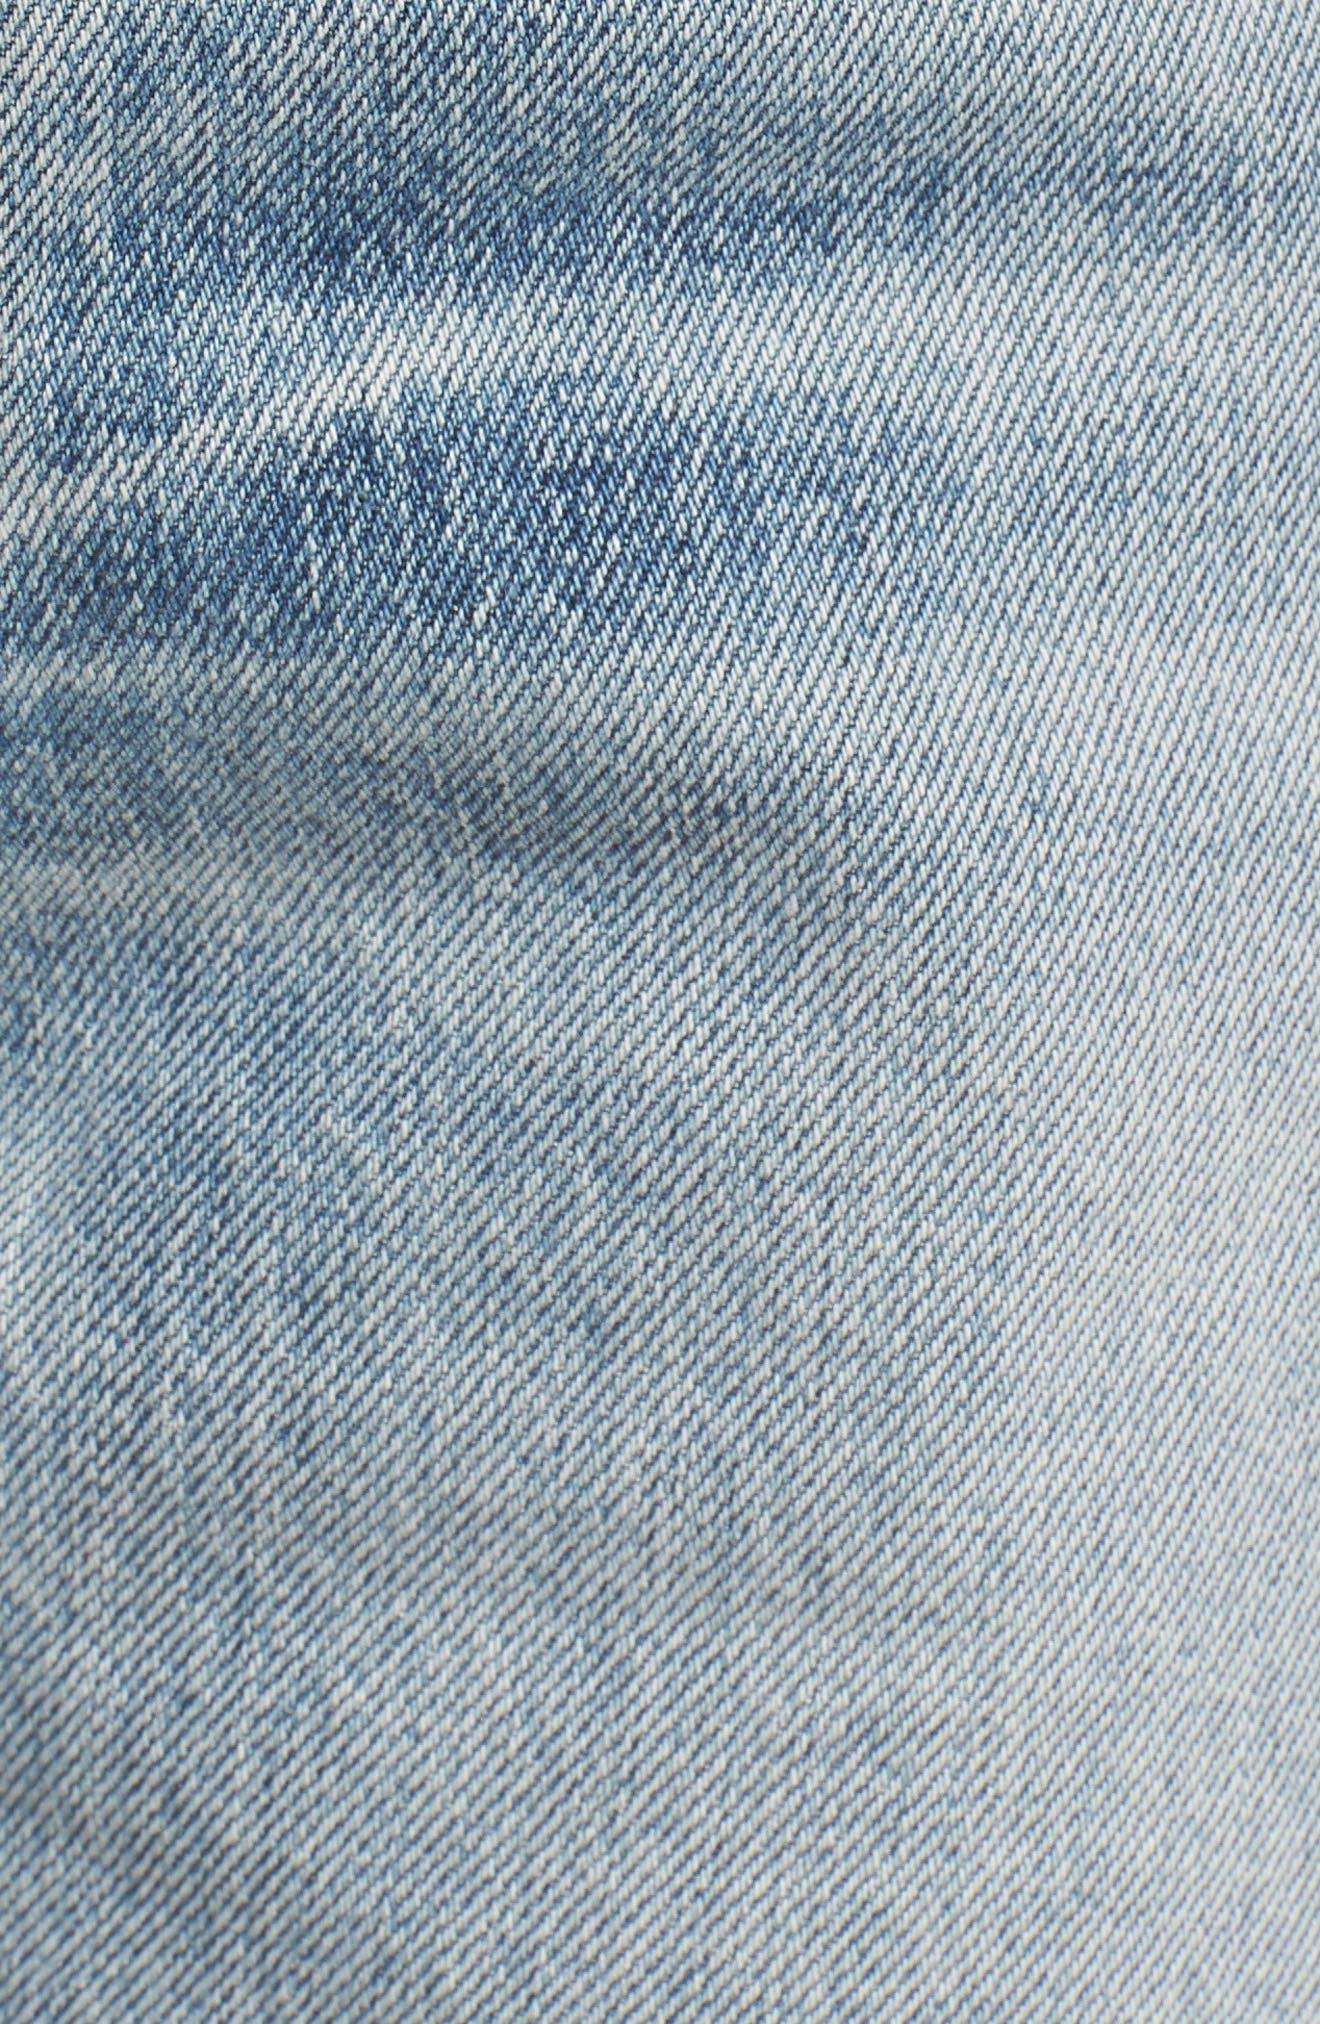 Jamie High Waist Ankle Jeans,                             Alternate thumbnail 5, color,                             Resolution